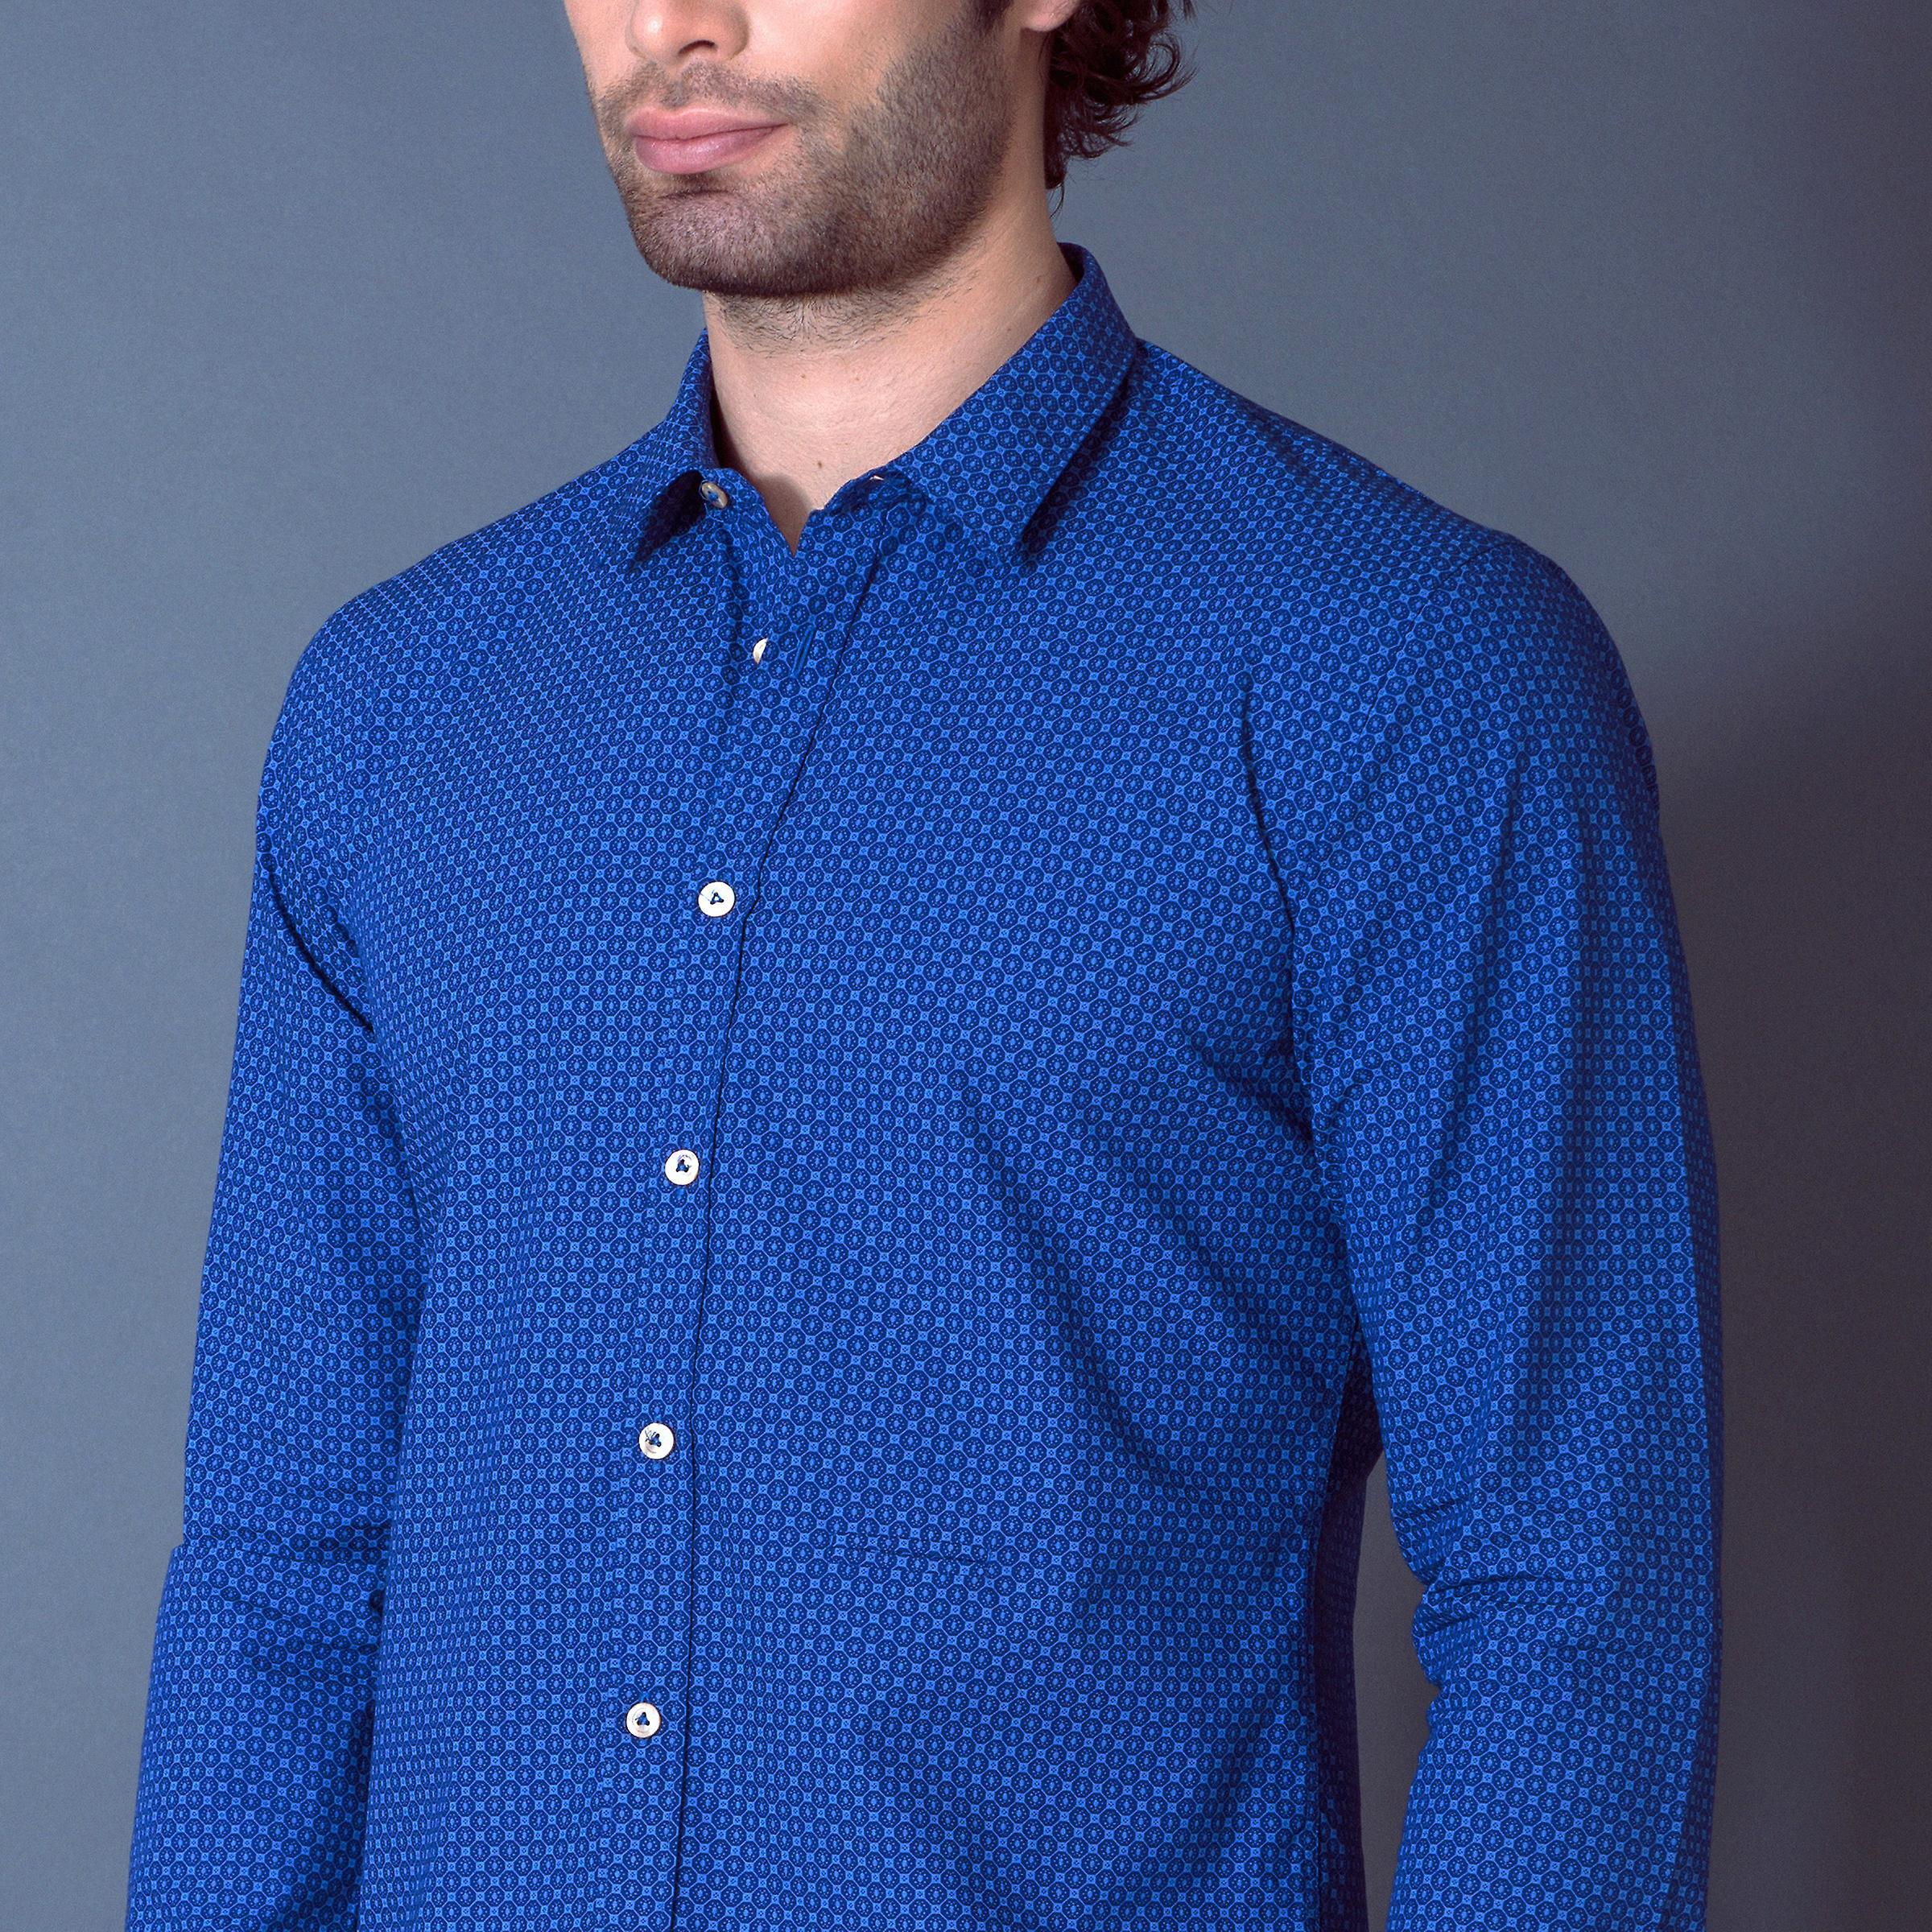 Fabio Giovanni Navoli Shirt - Mens Italian Casual Stylish Shirt 100% Cotton - Long Sleeve